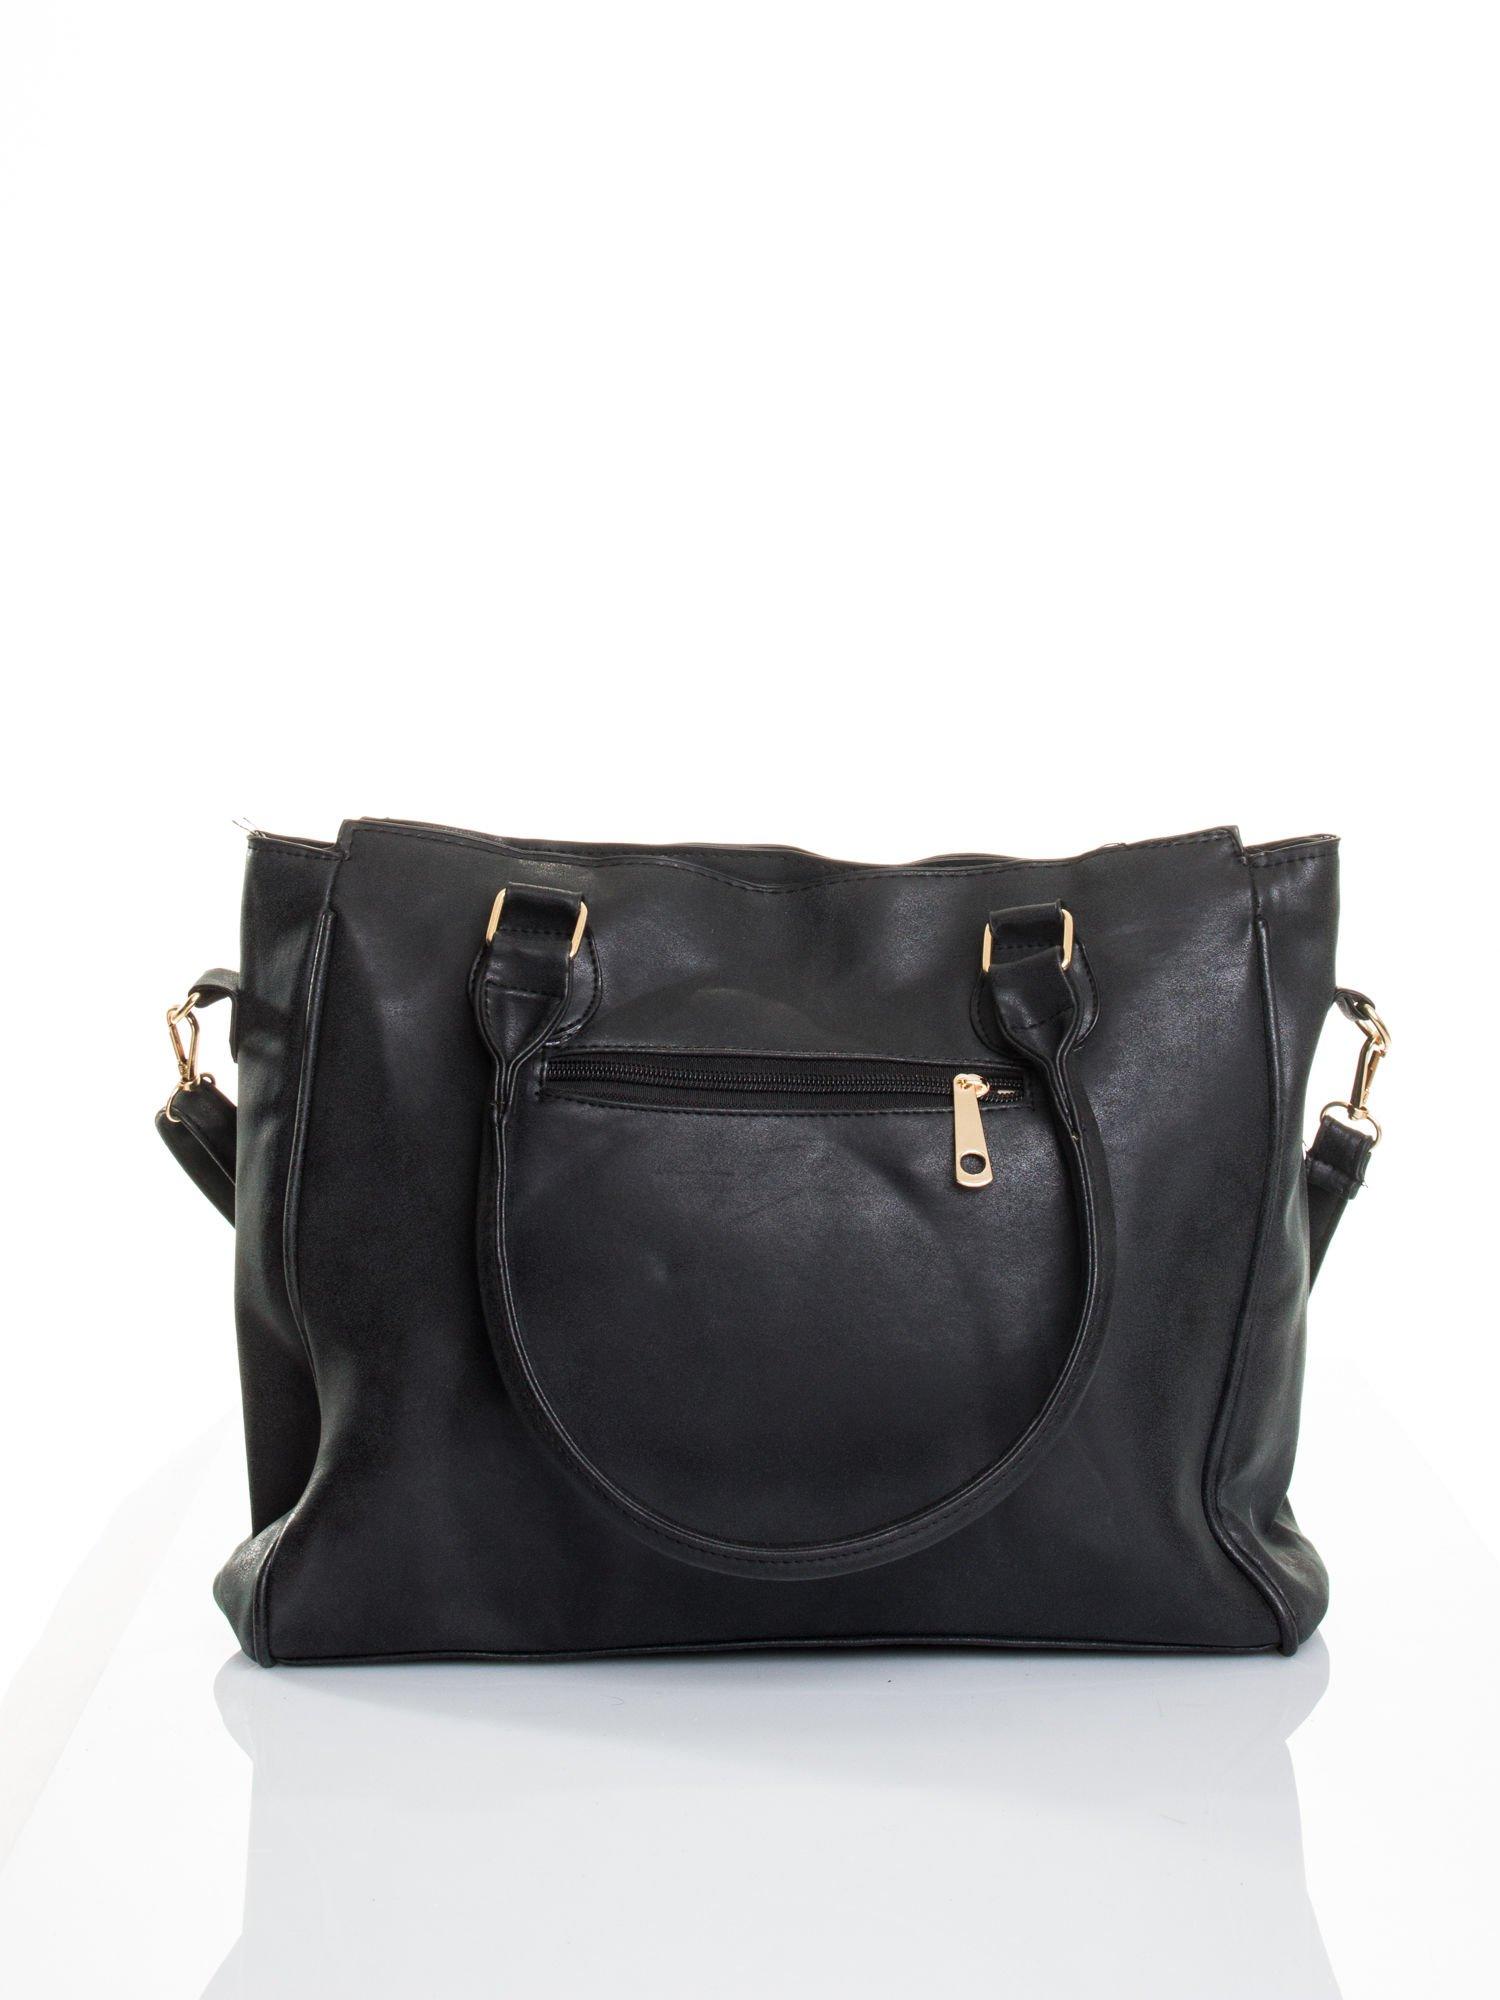 Czarna torebka miejska                                  zdj.                                  2